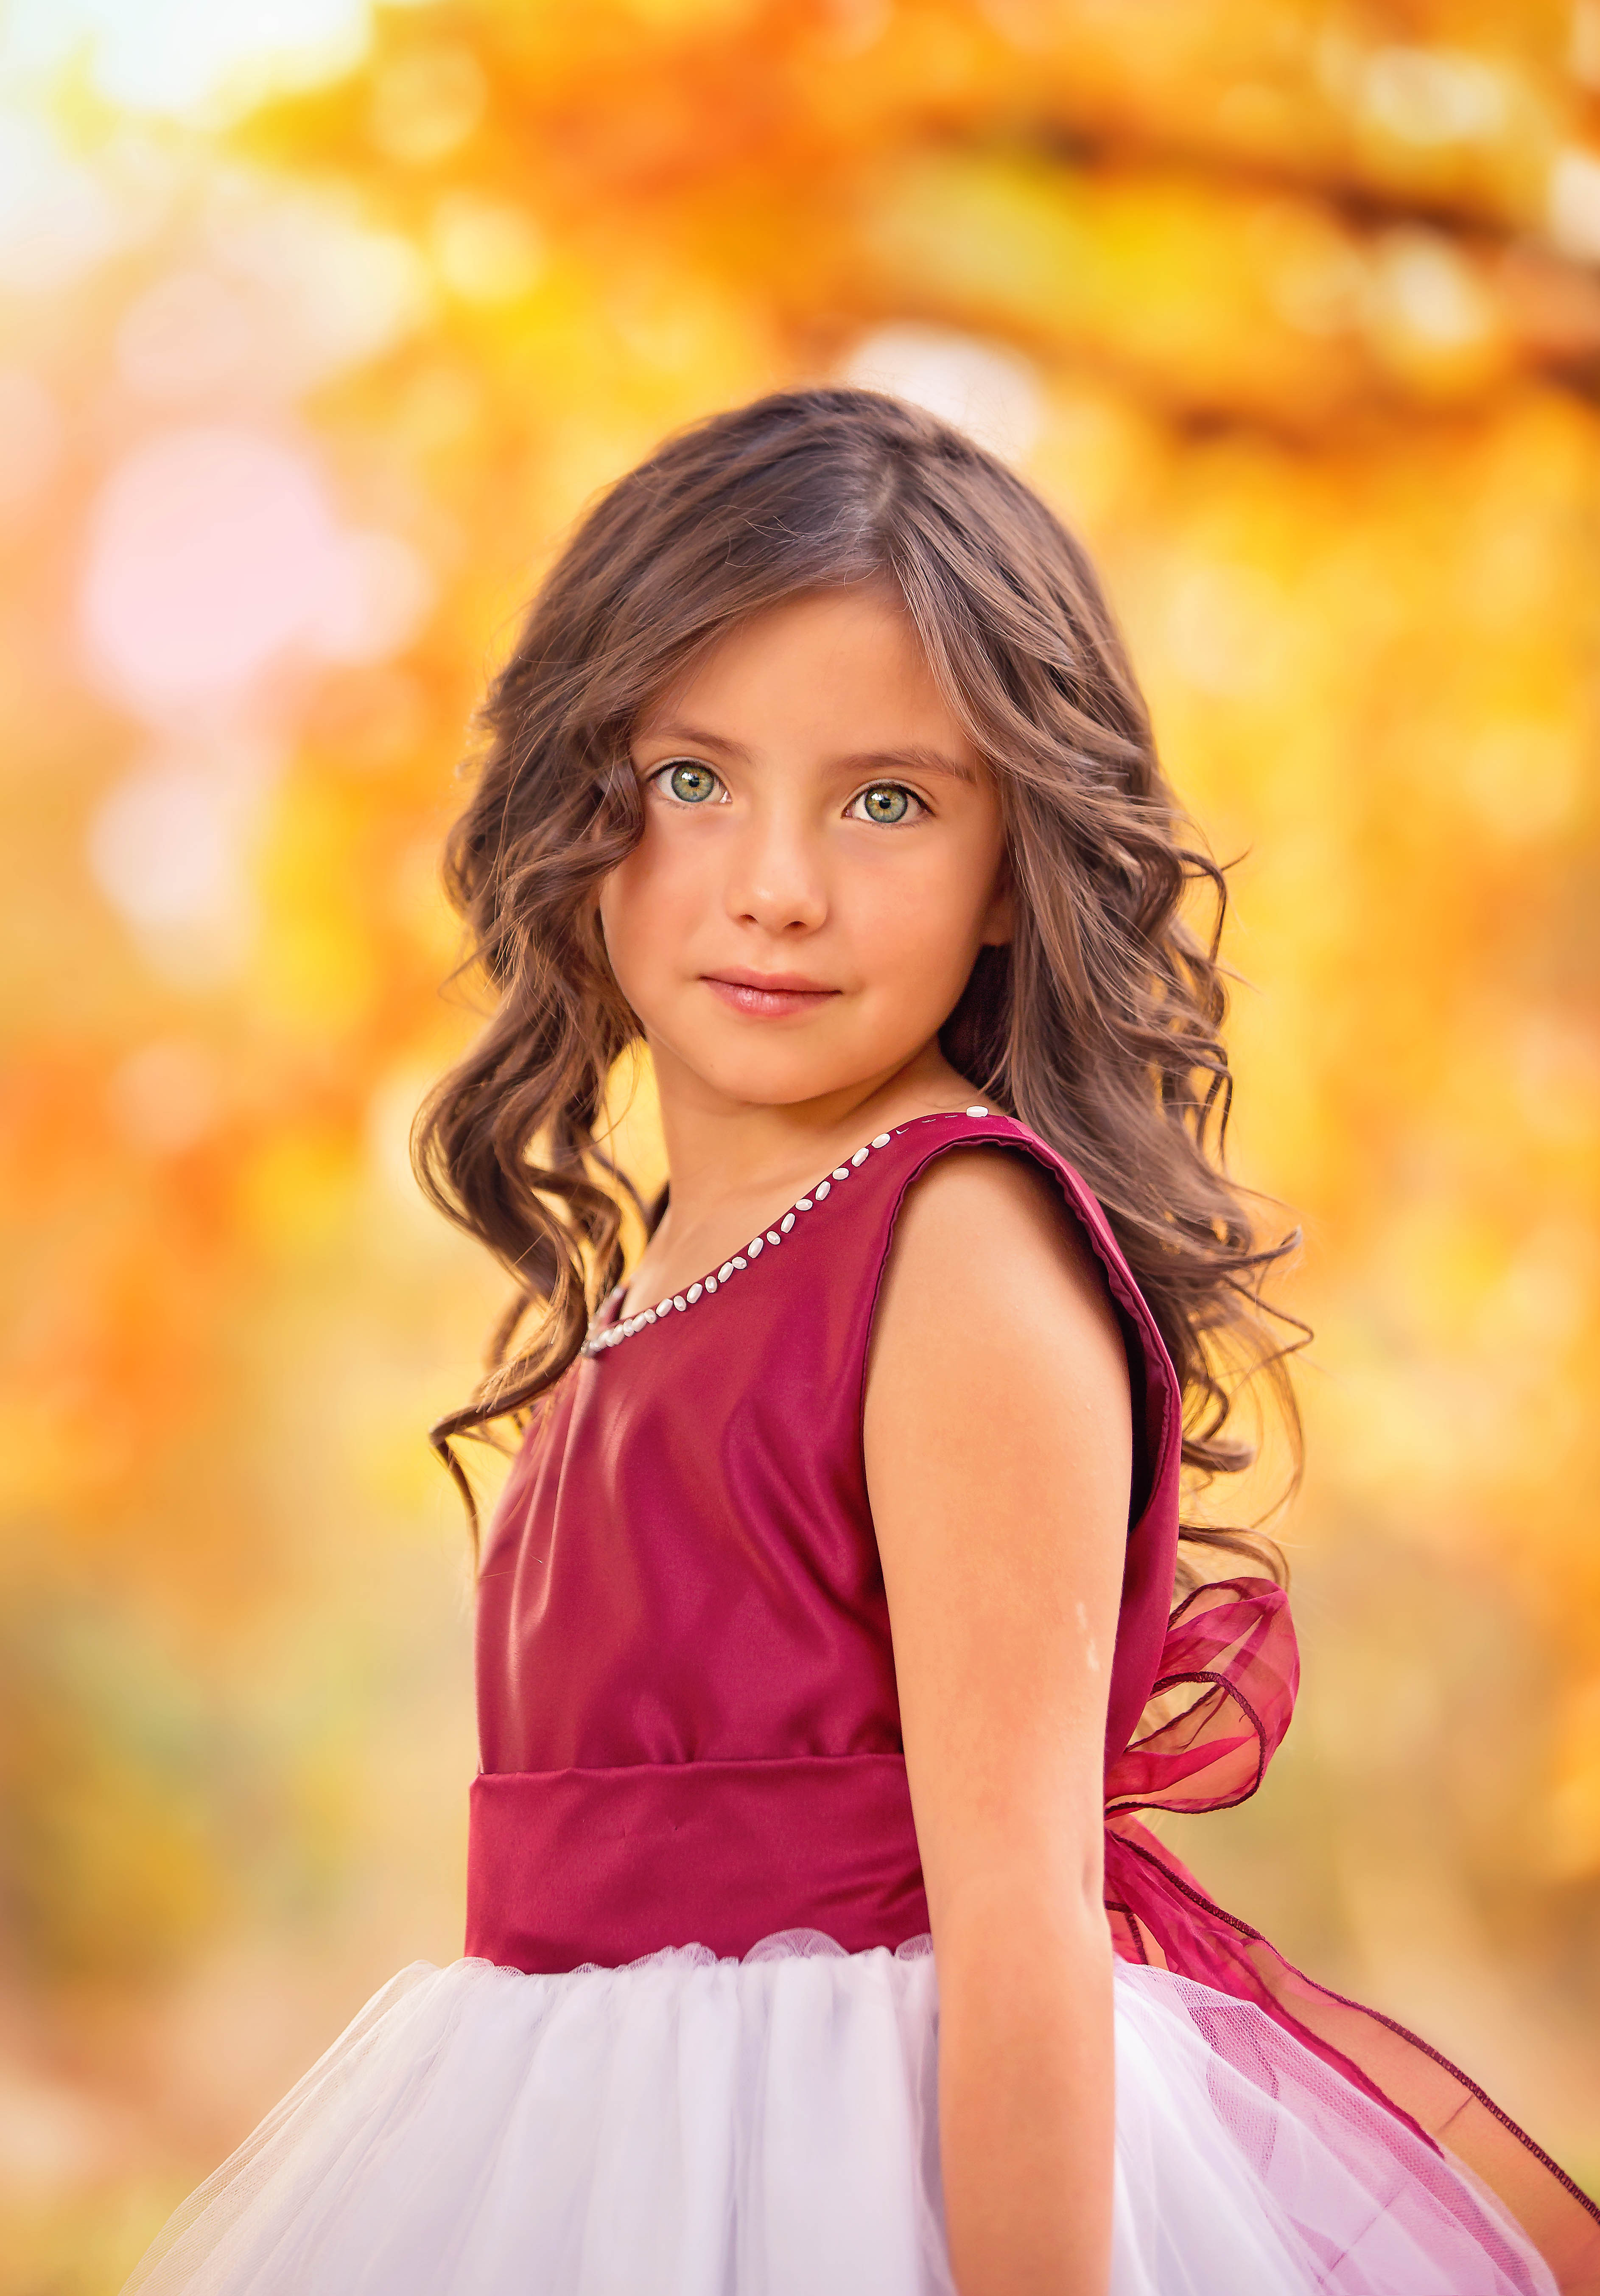 princess photos for your girl